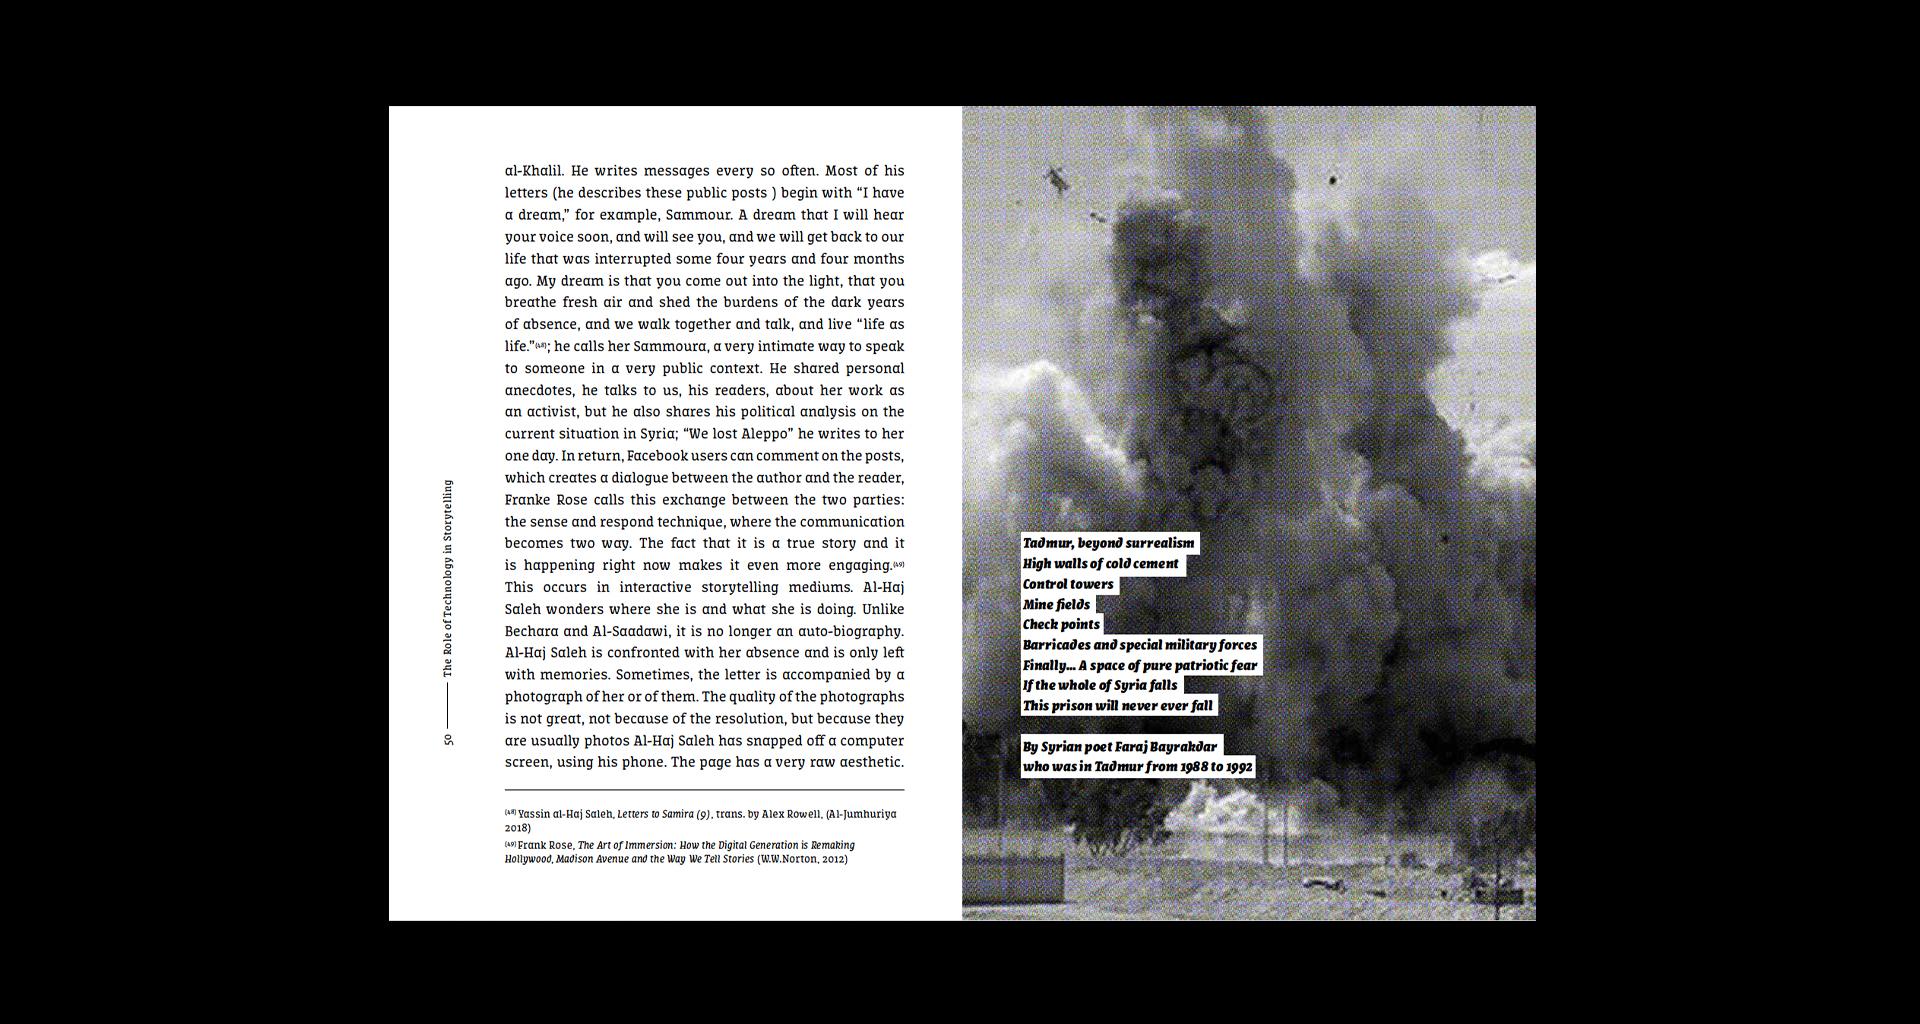 Dissertation_Photo_0001_Screenshot 2019-08-19 at 13.38.28.jpg